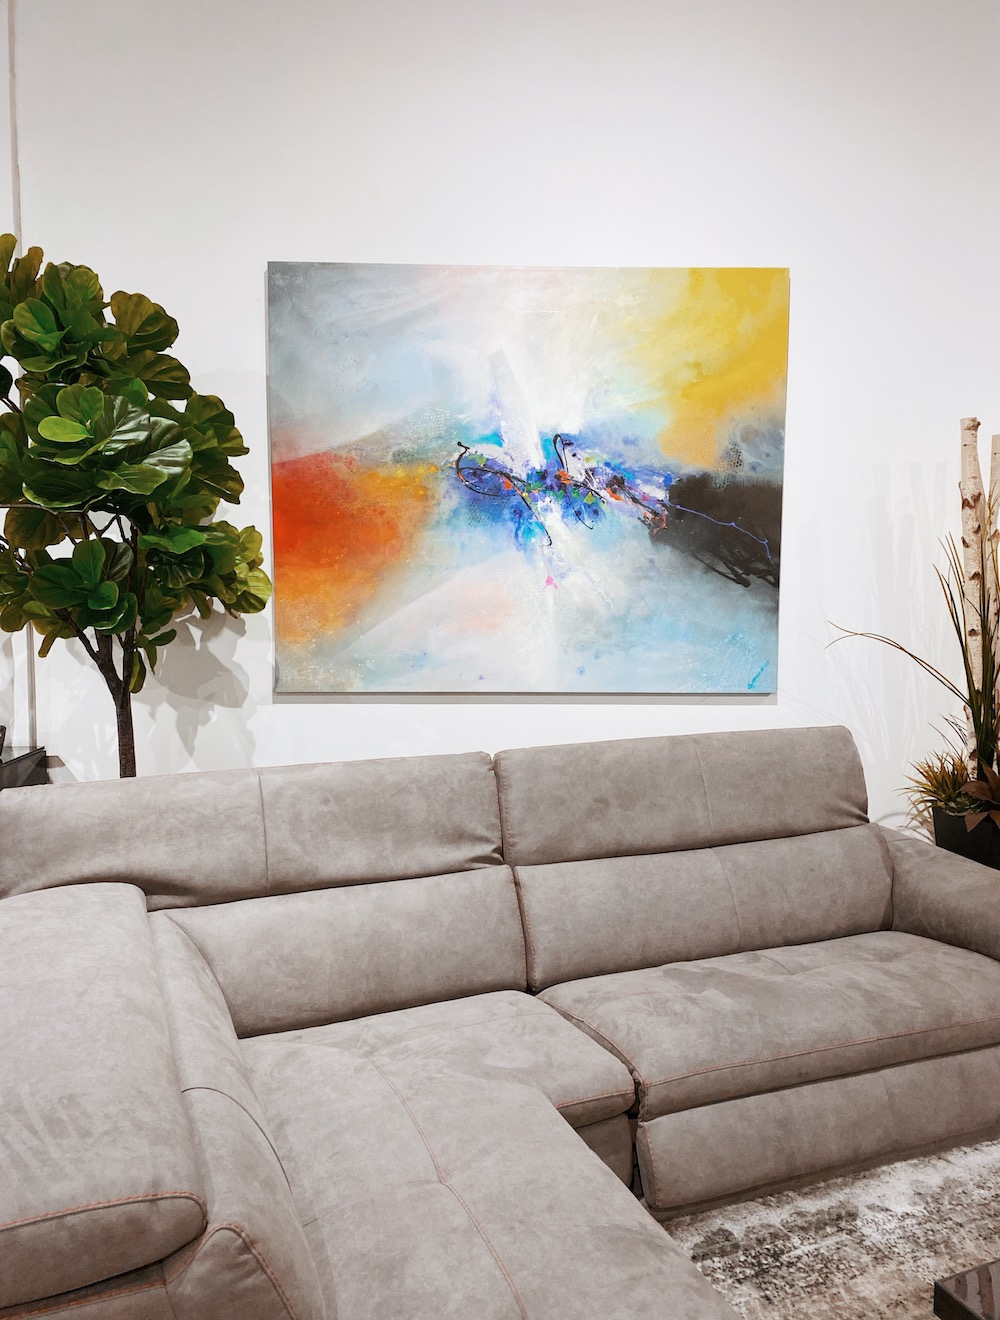 martin daniel interiors wall art Toronto home decor 4